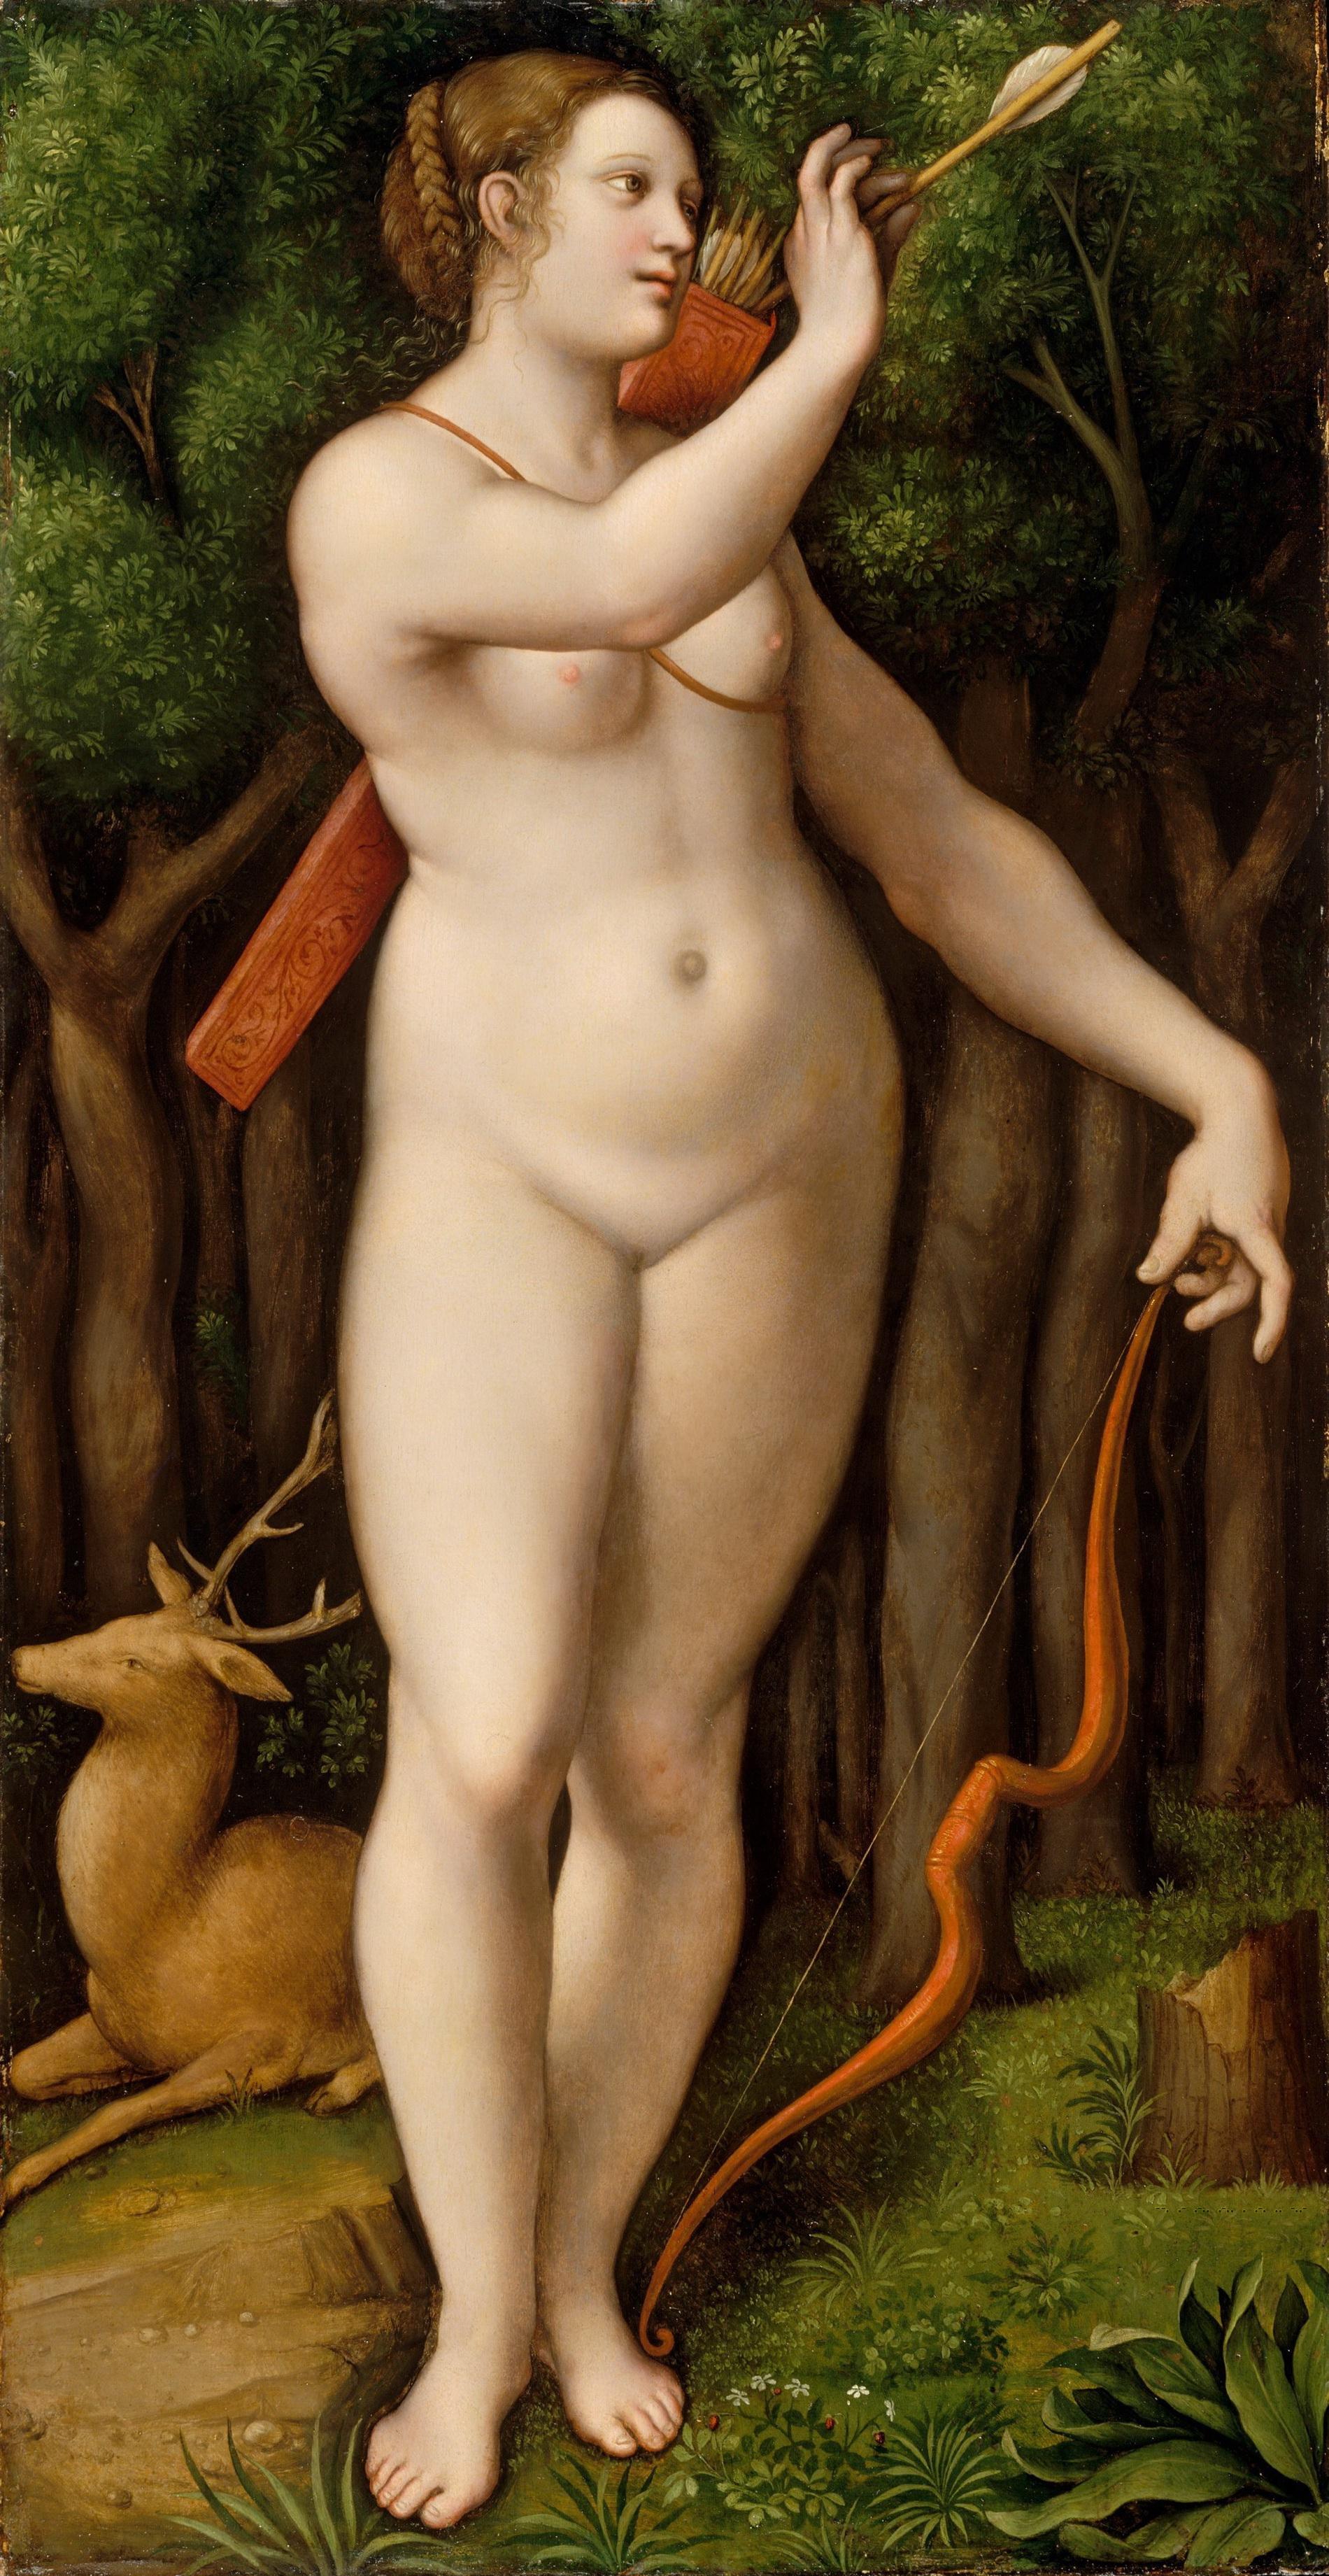 Giampetrino, 1495-1549. Диана-охотница. позже 1526. Нью-Йорк, музей Метрополитен